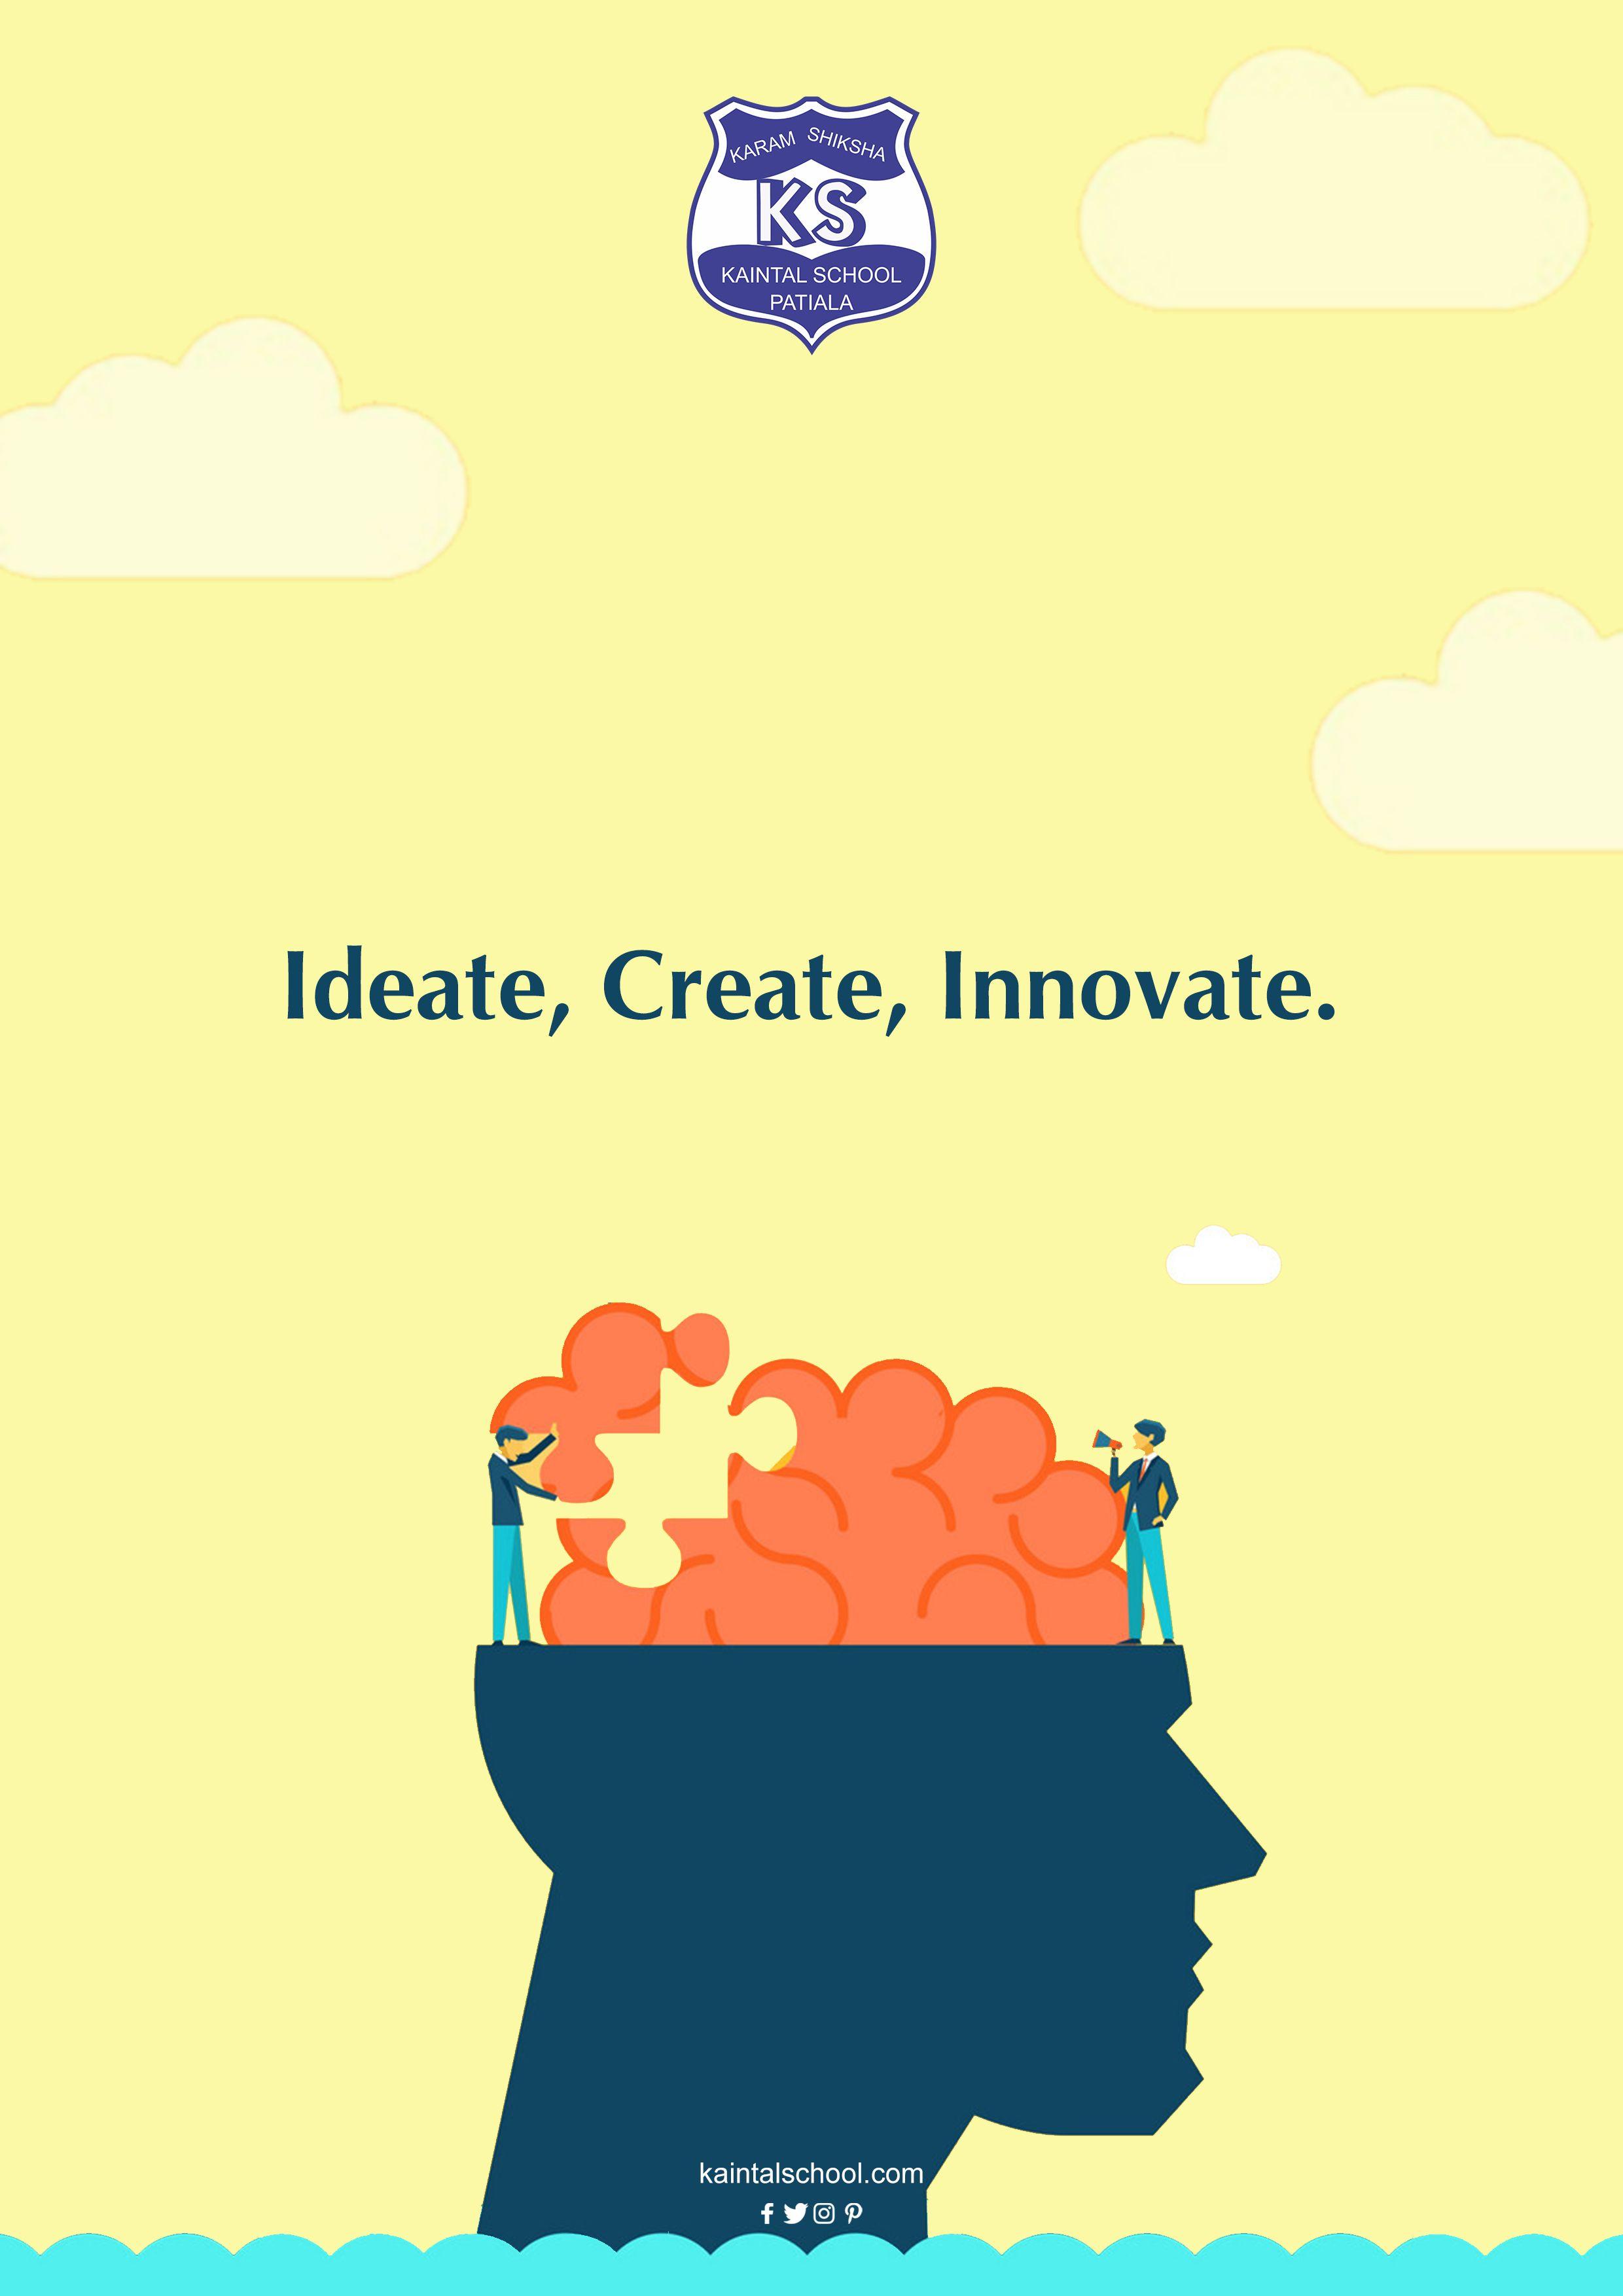 Ideate Create And Innovate At Kaintal School Kaintalschool Patiala Icse School Education Students School Fun School Tops School